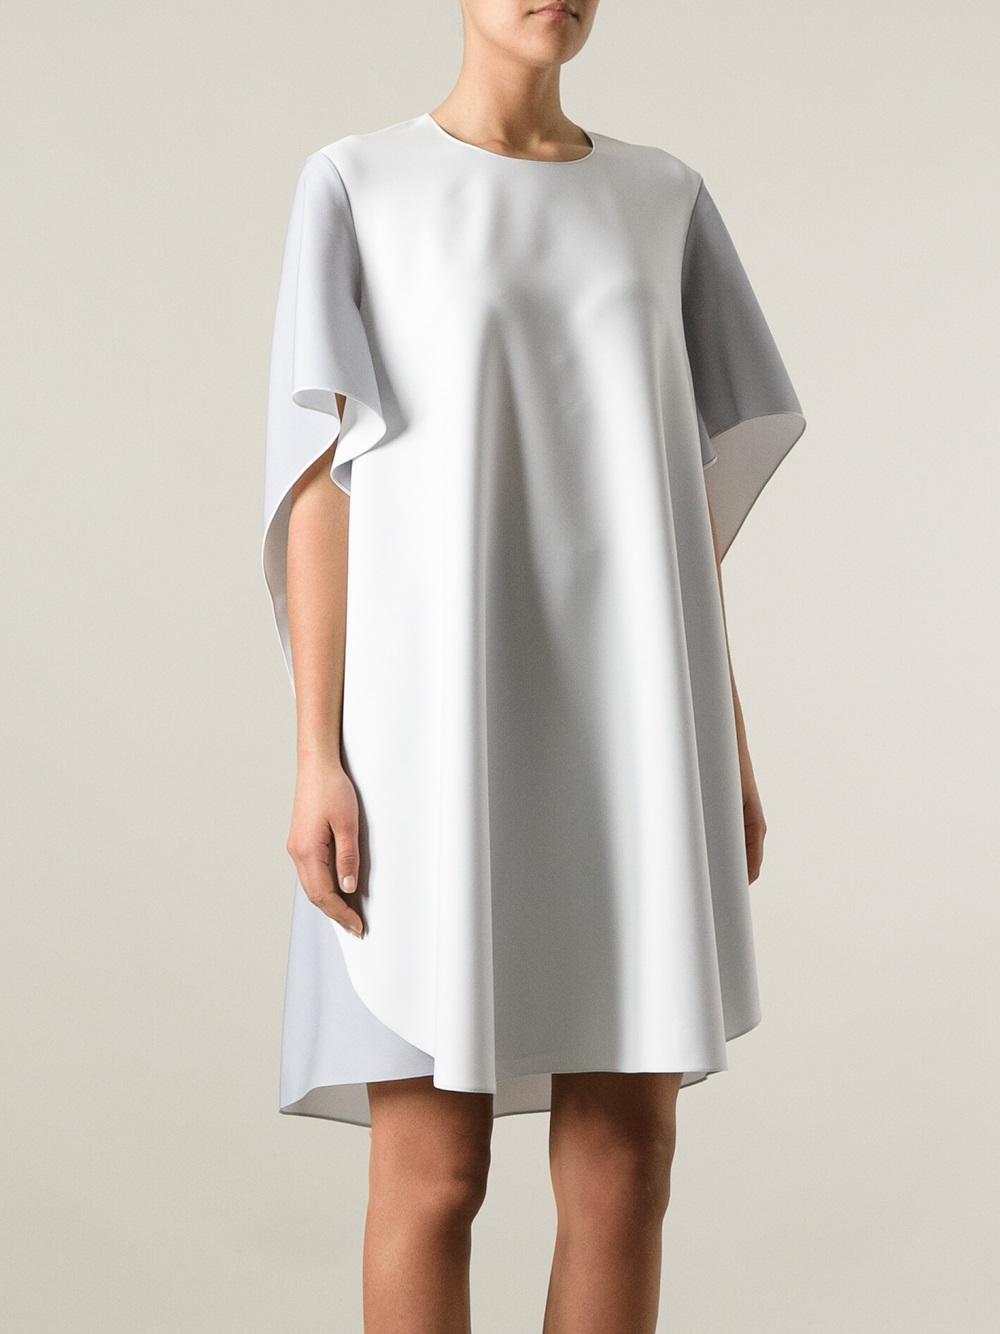 DRESSES - Short dresses Maison Rabih Kayrouz rNbq3